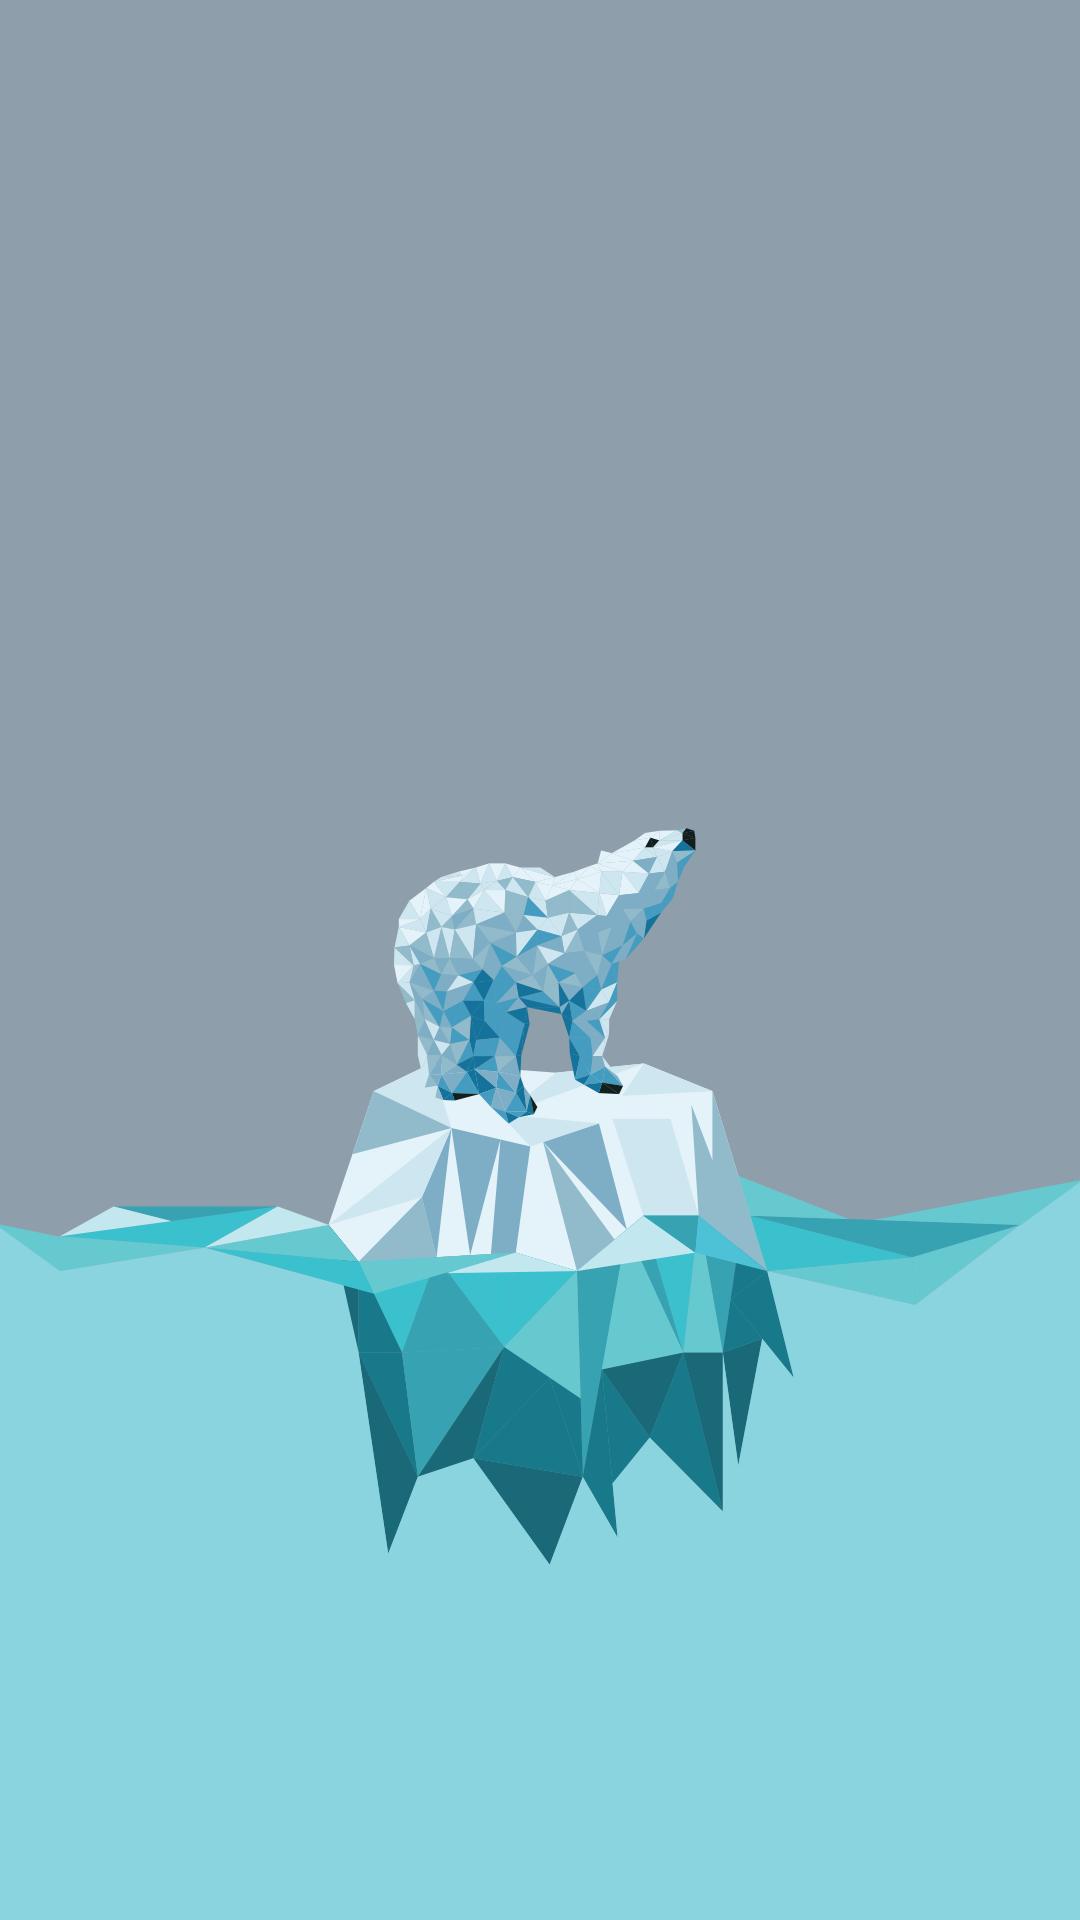 Minimal Iphone Wallpaper Polar Bear With Images Geometric